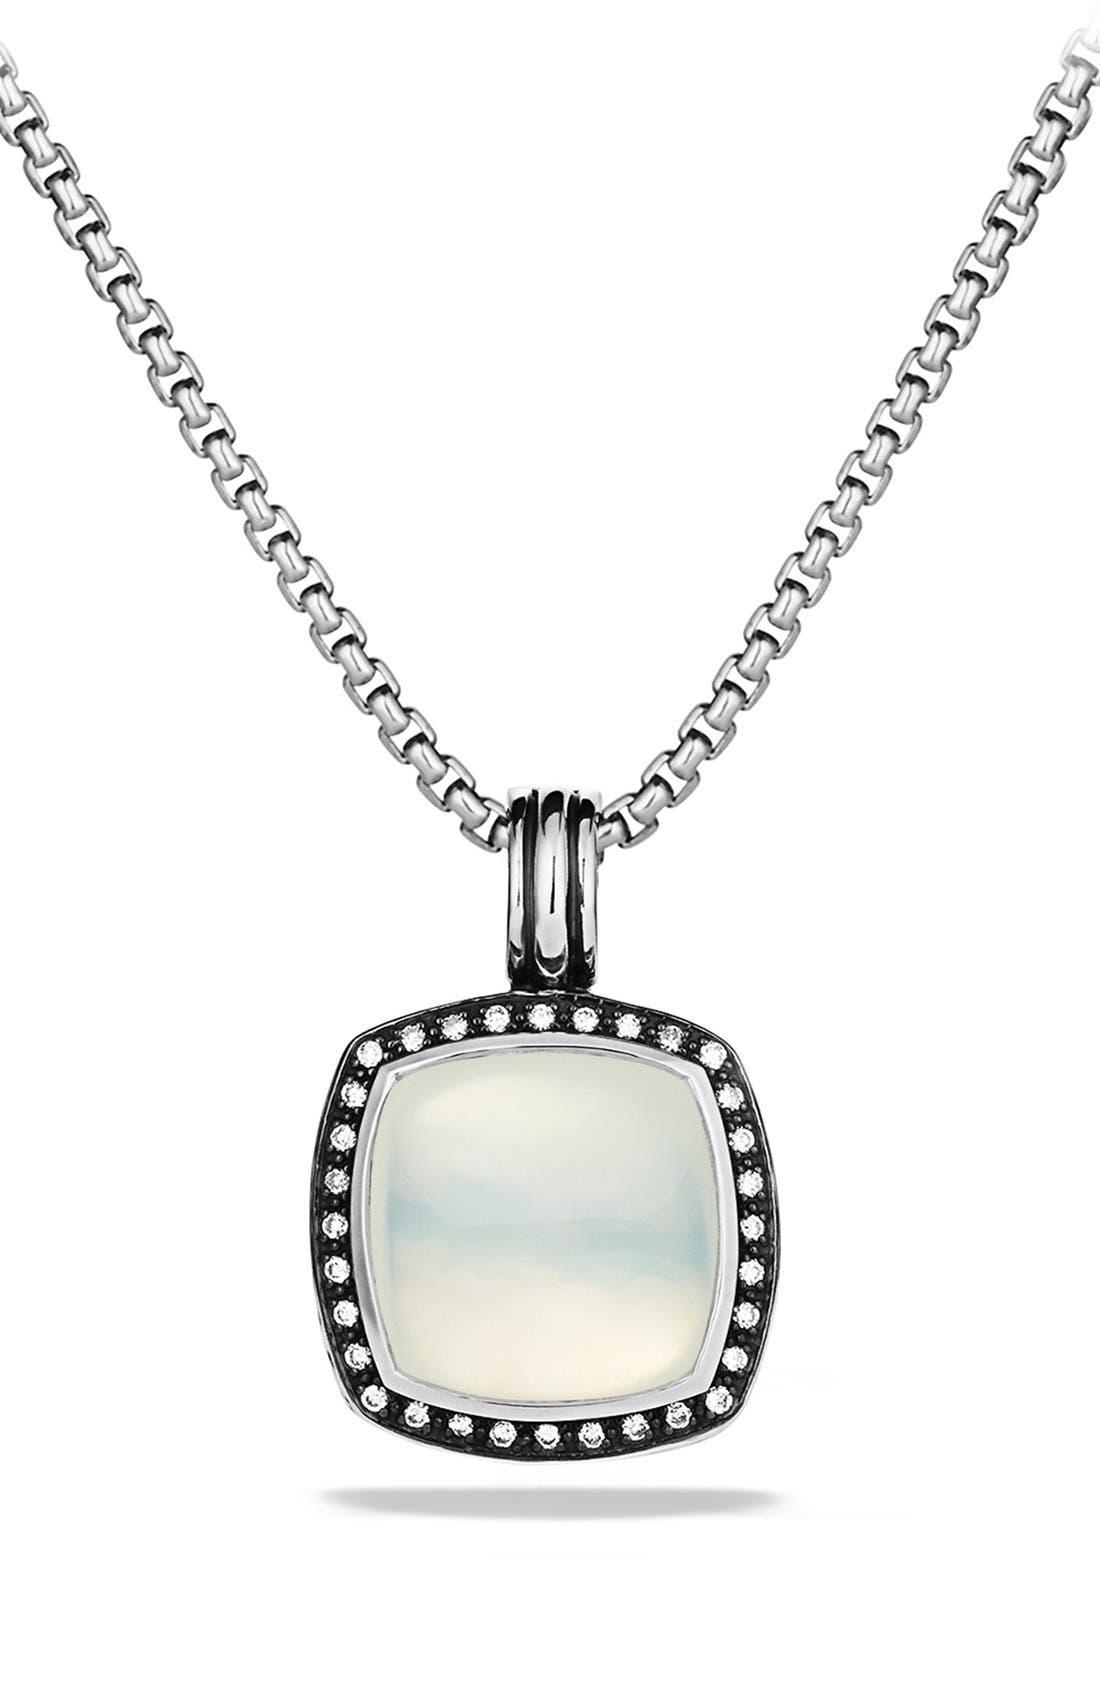 Main Image - David Yurman 'Albion' Pendant with Moon Quartz and Diamonds